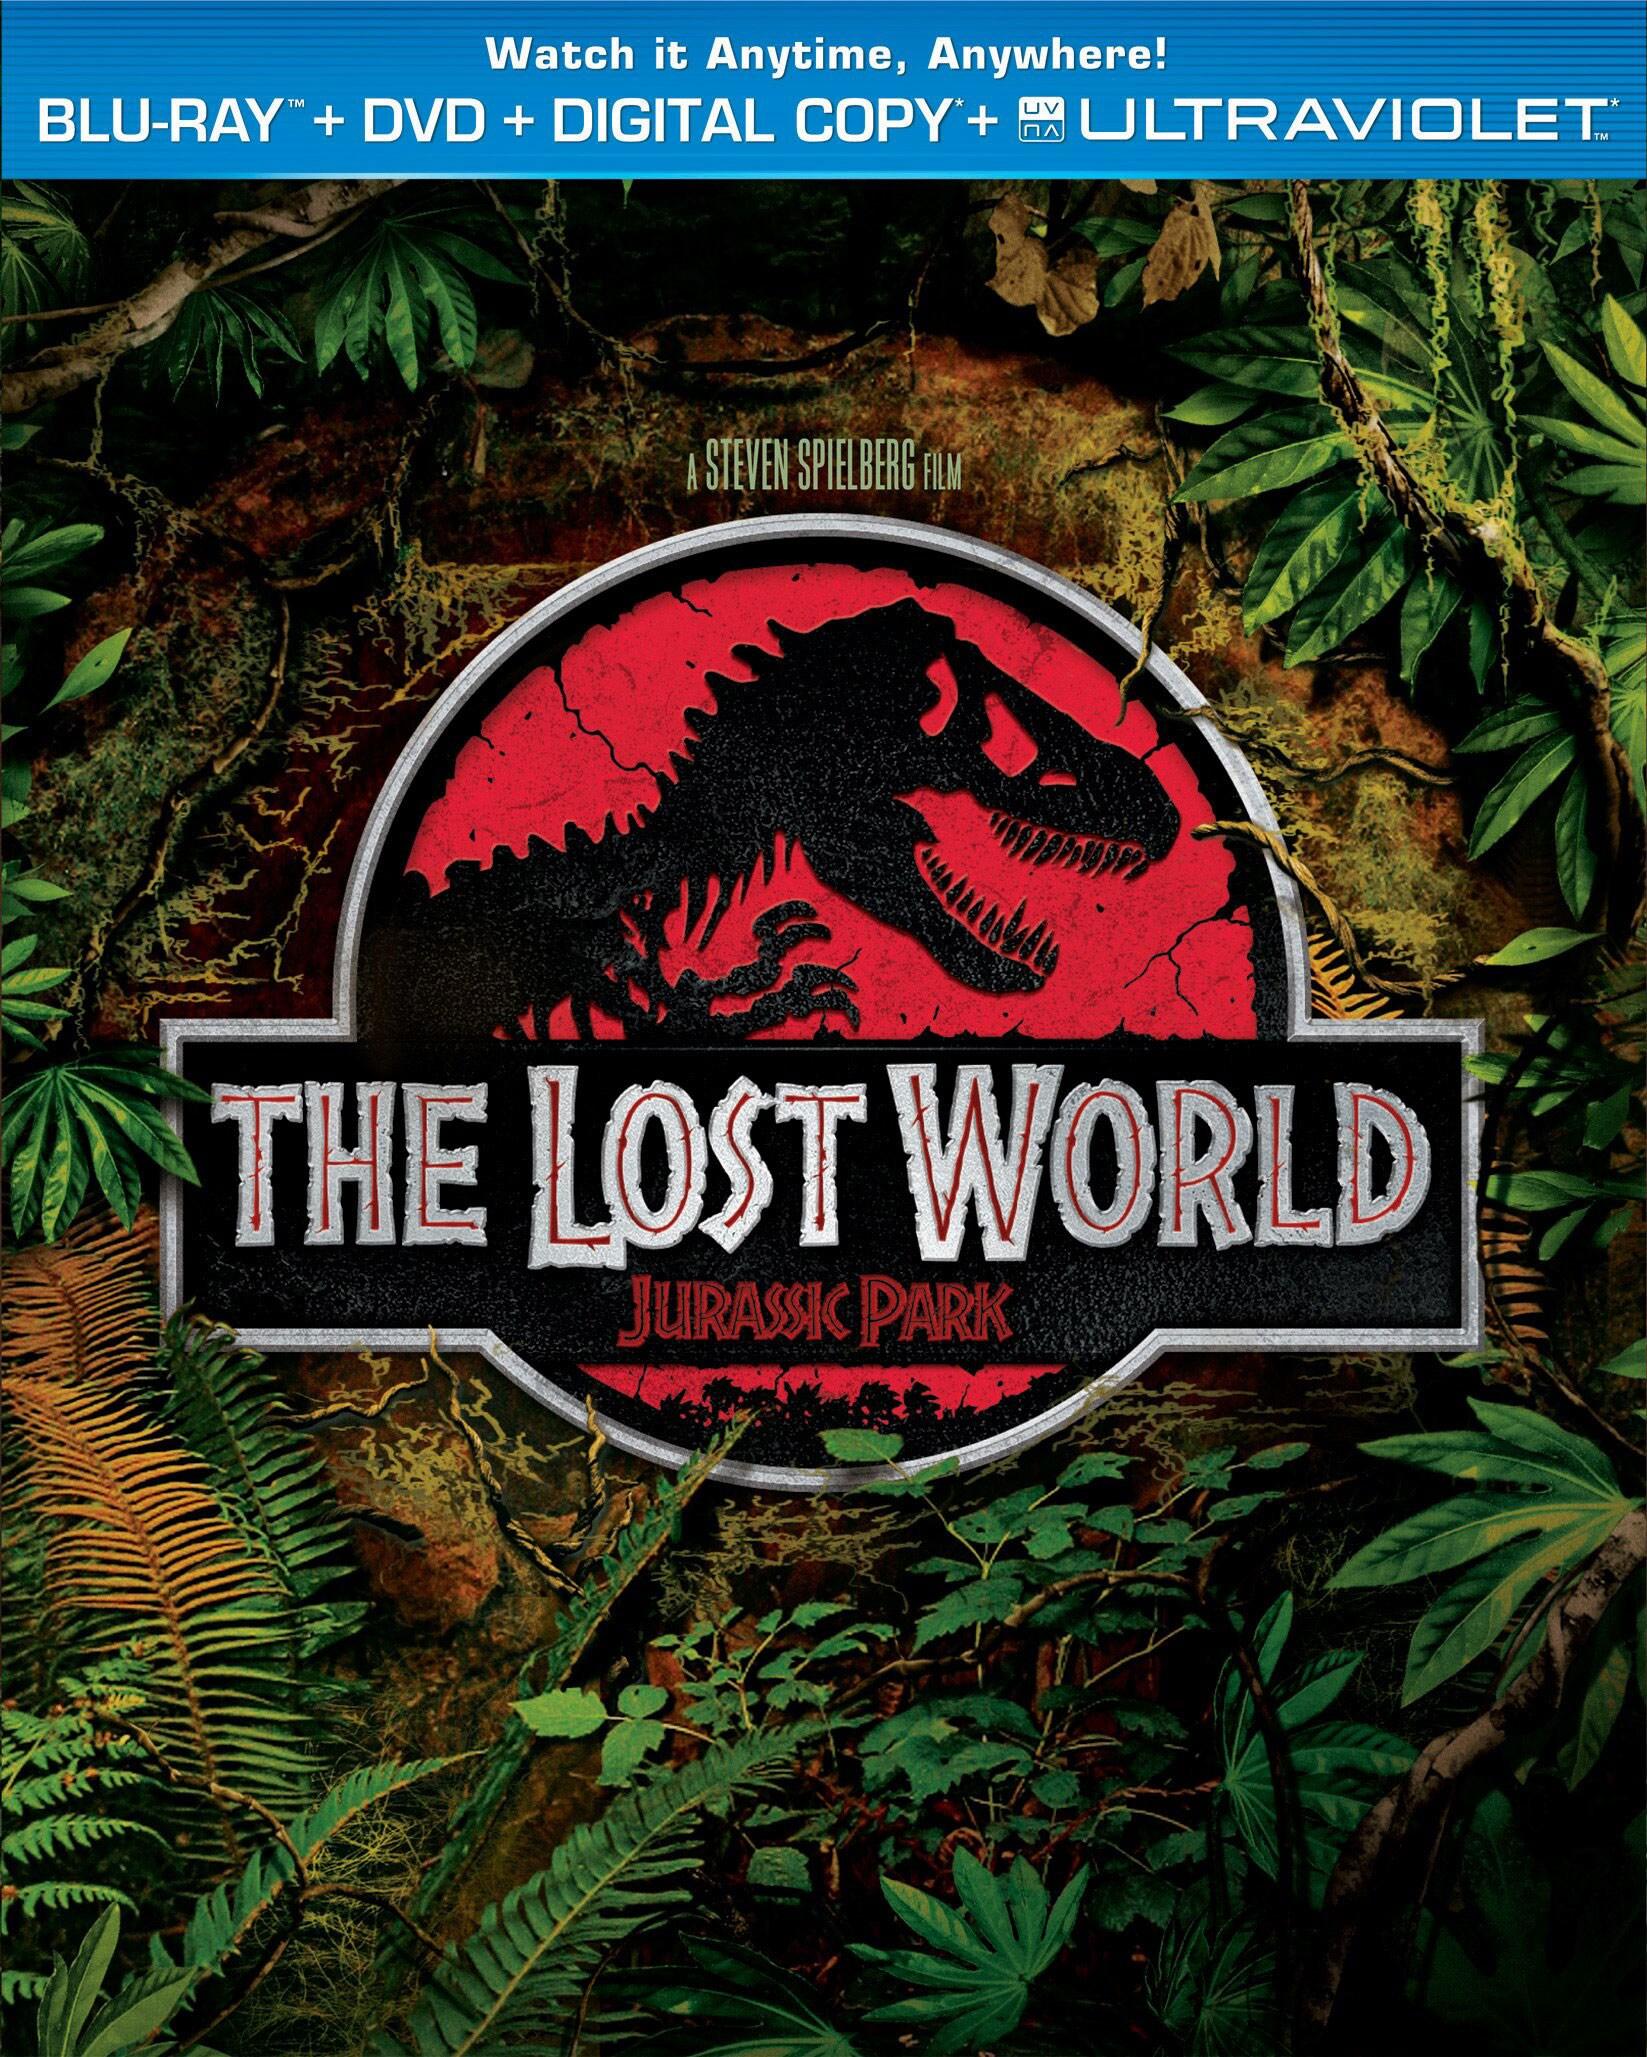 The Lost World: Jurassic Park (Blu-ray/DVD)